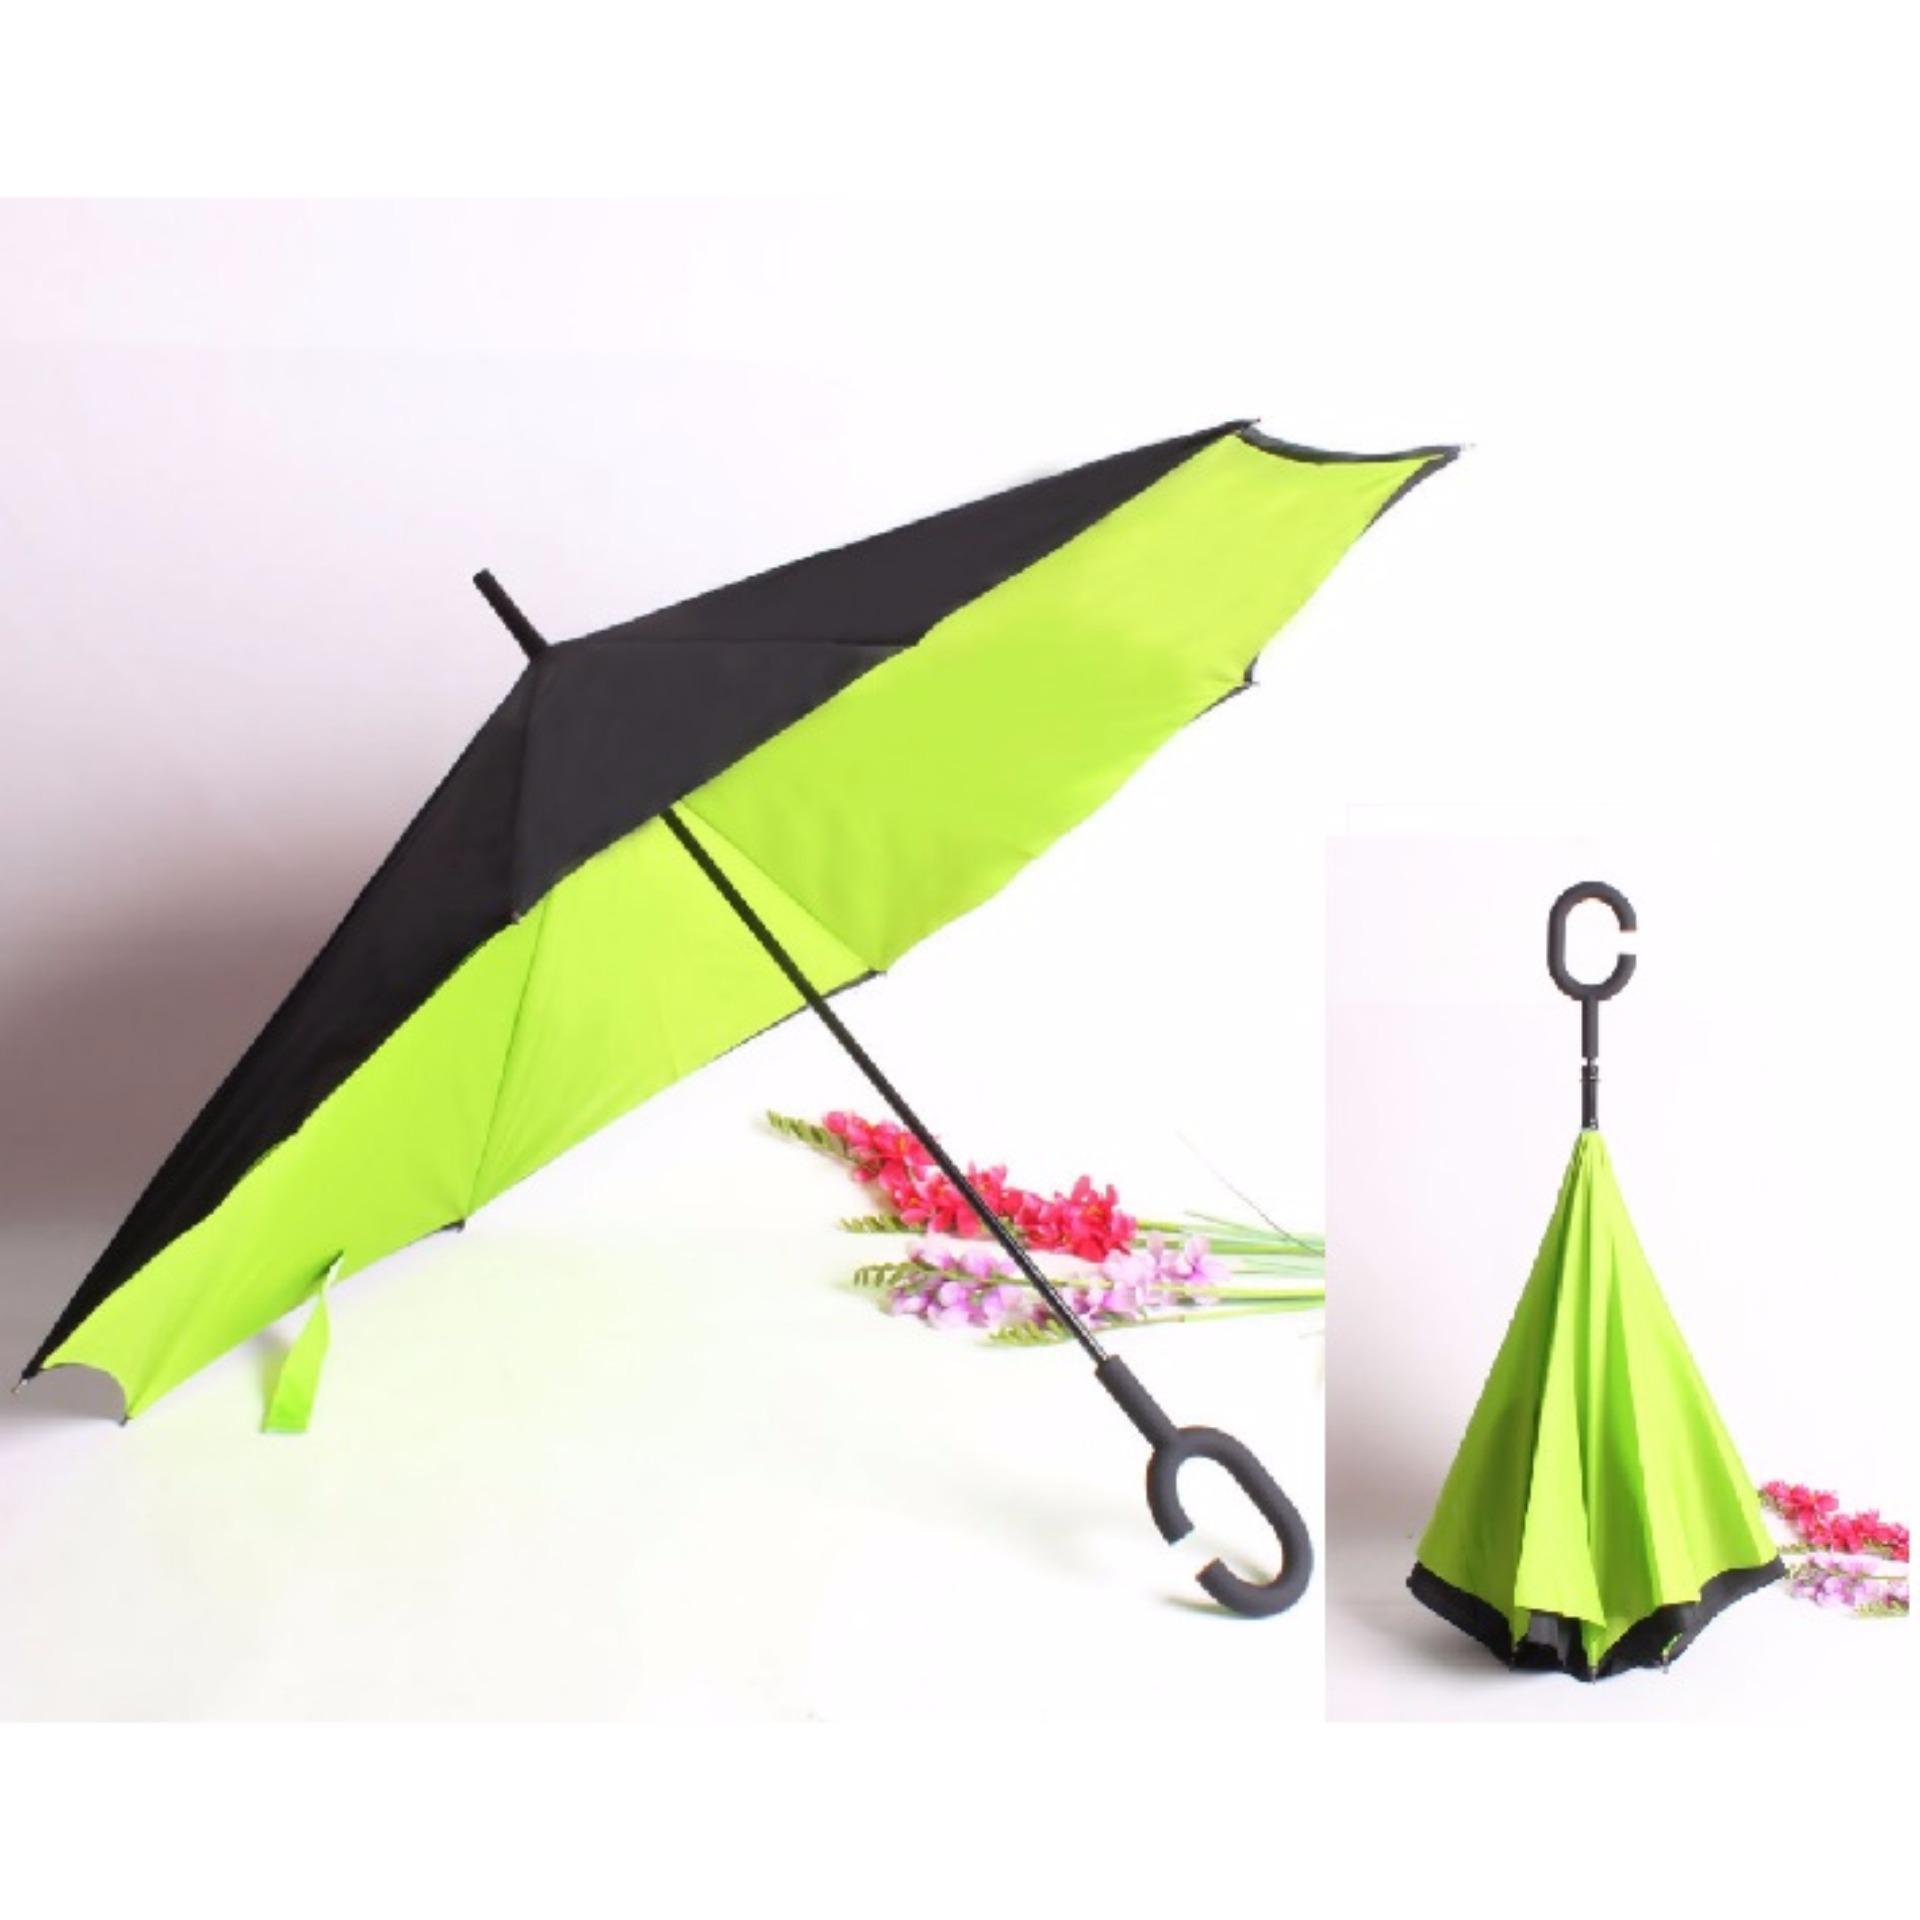 Cheap online BEST Payung Terbalik KAZBRELLA 01 Gagang C Reverse Umbrella PayungLipat / Mobil - HIJAU MUDA